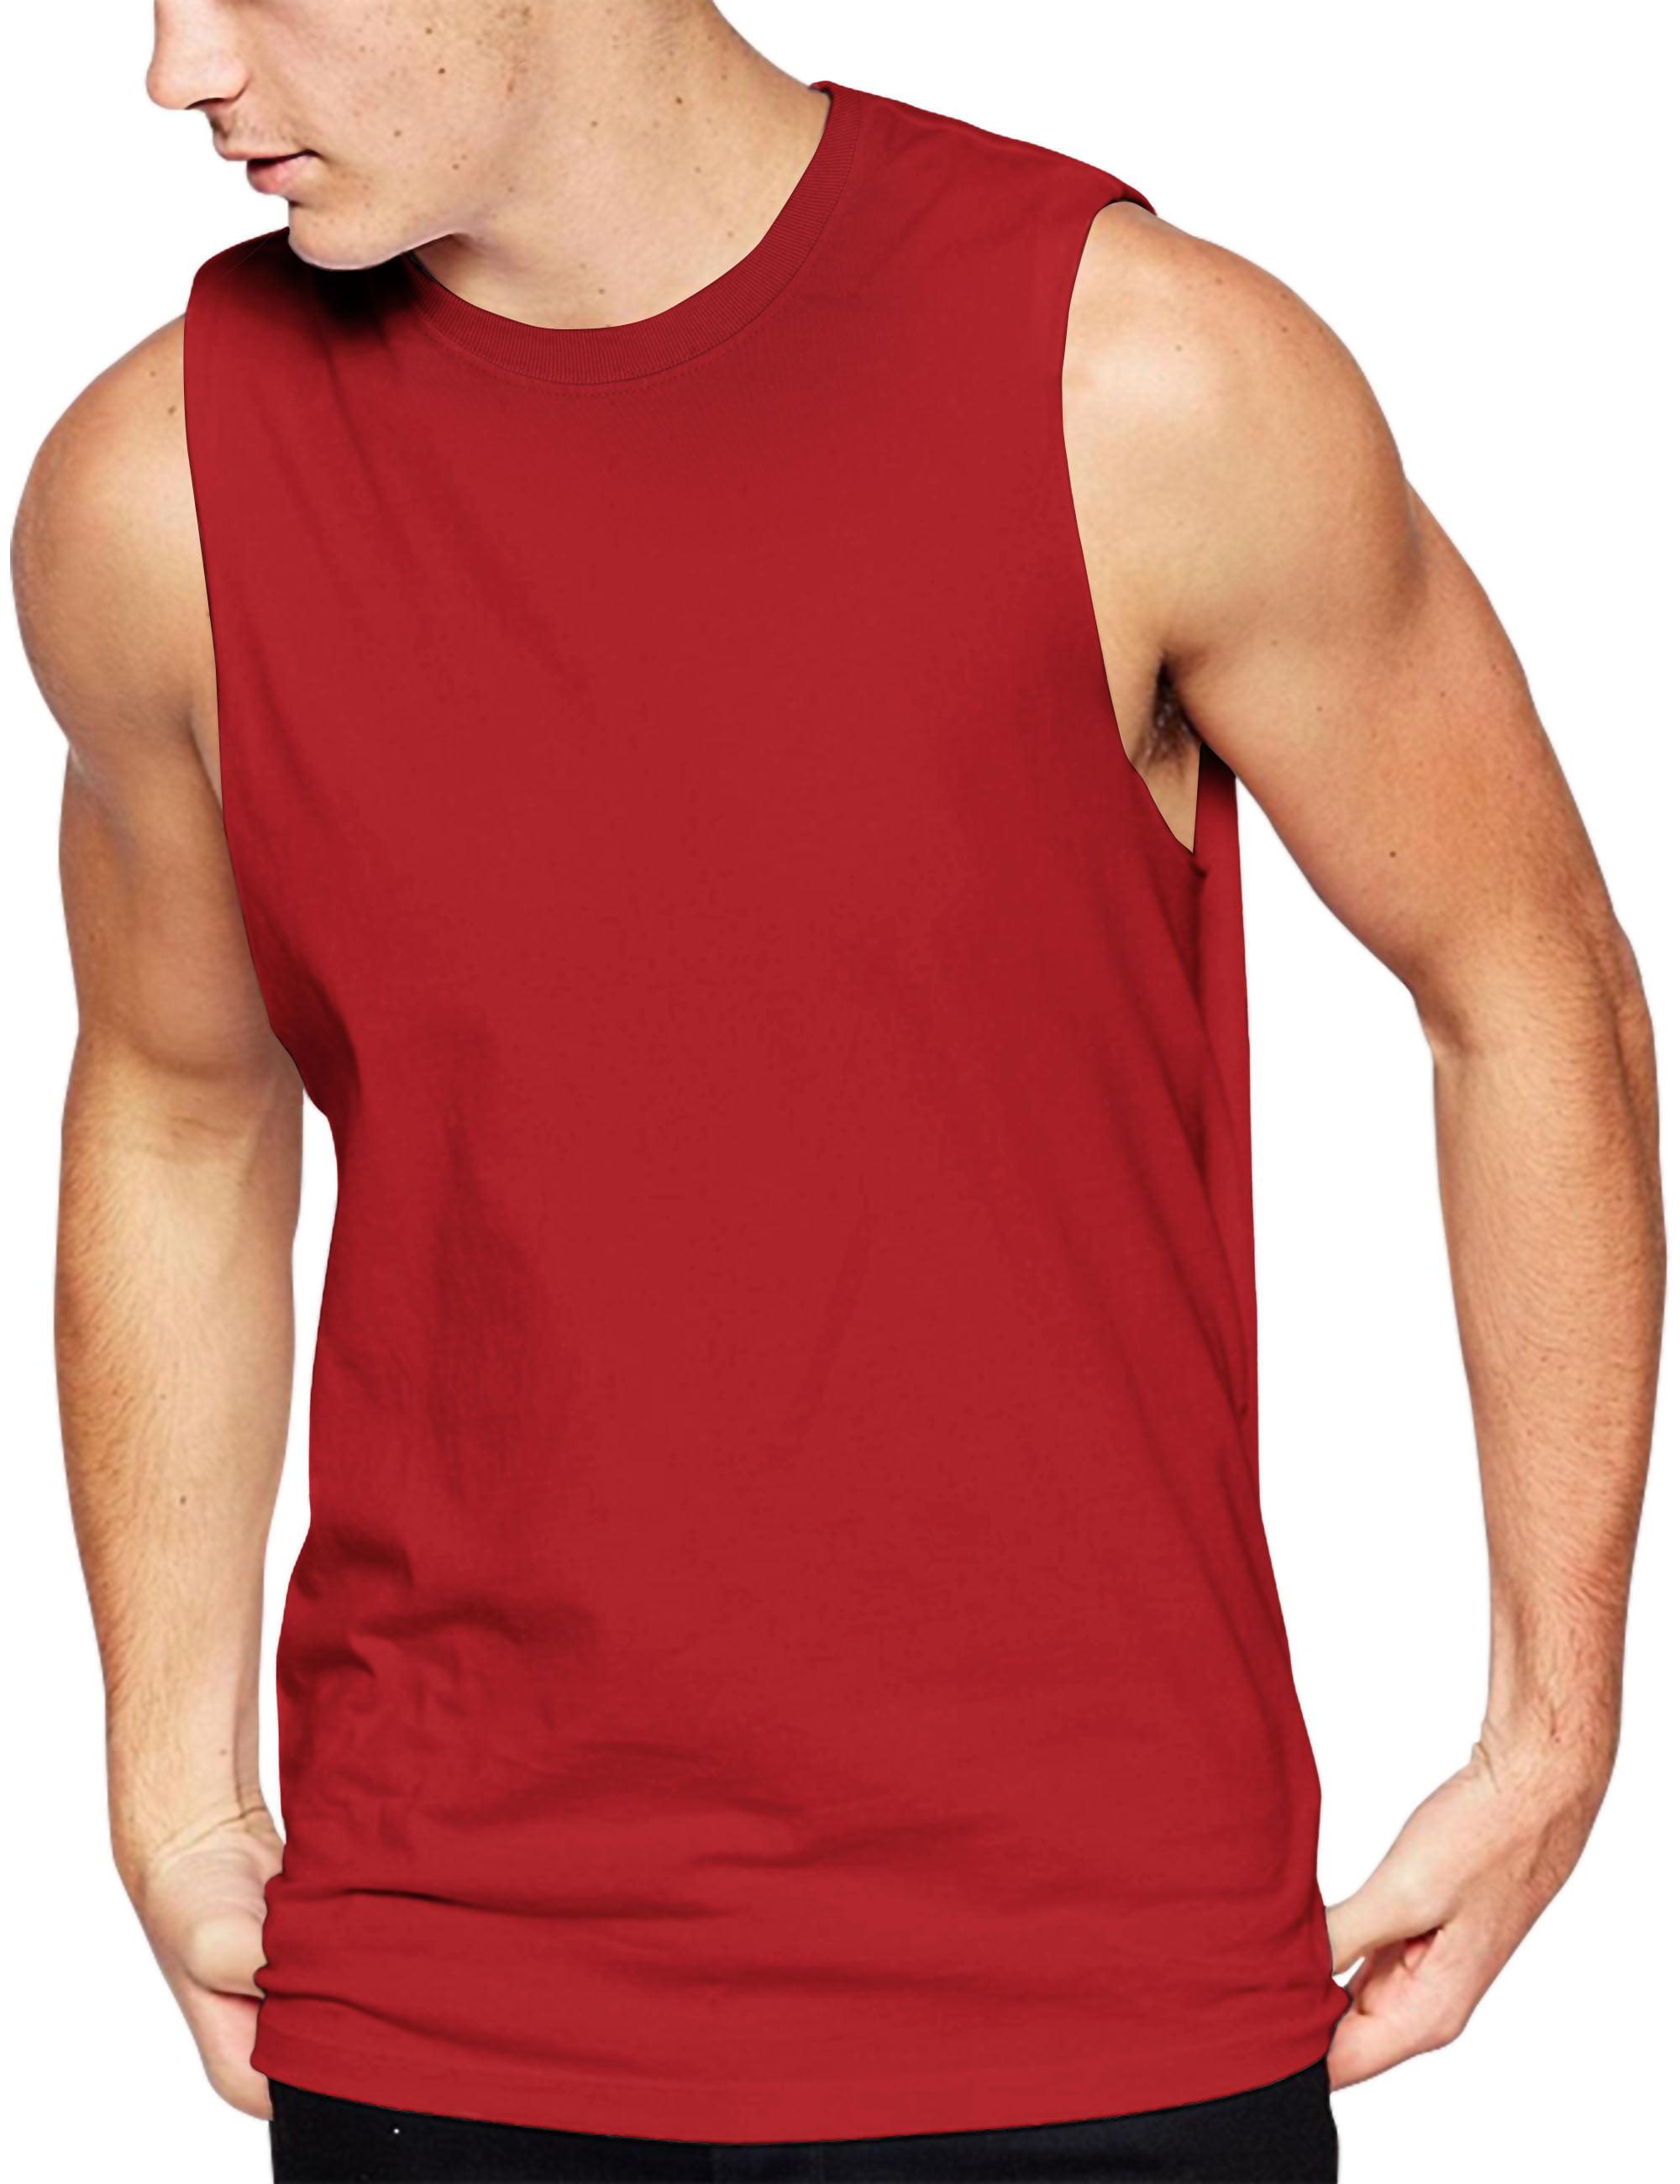 Men's Sleeveless Tee Shirts Muscle Gym Tank Top